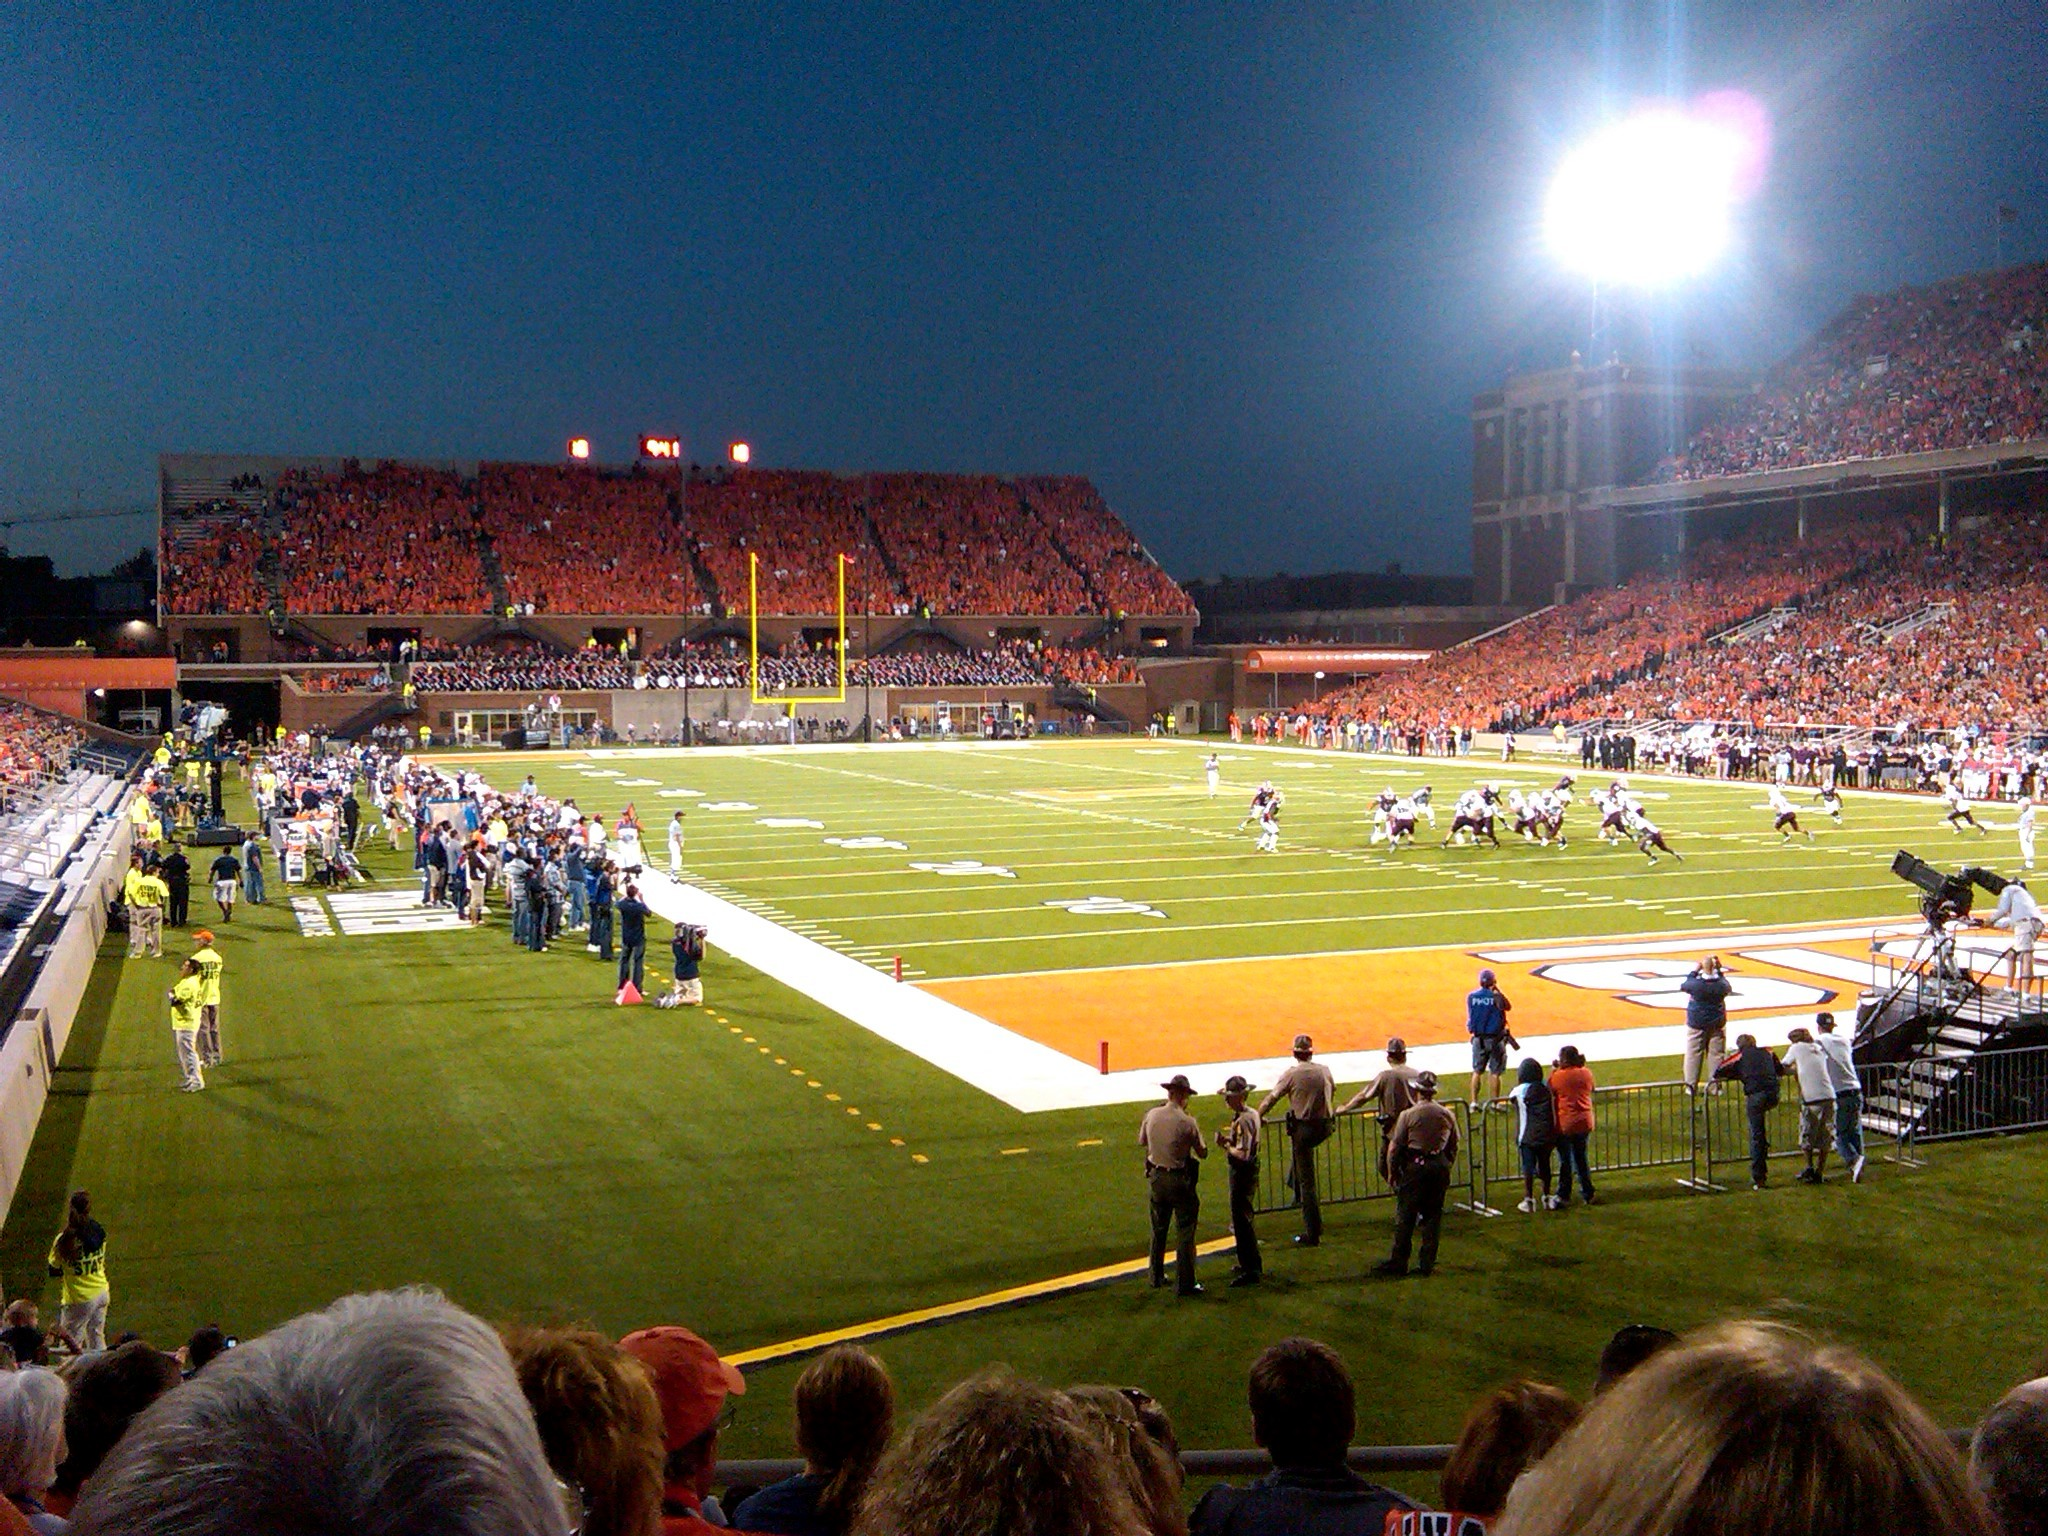 2010 game at Memorial Stadium in Champaign